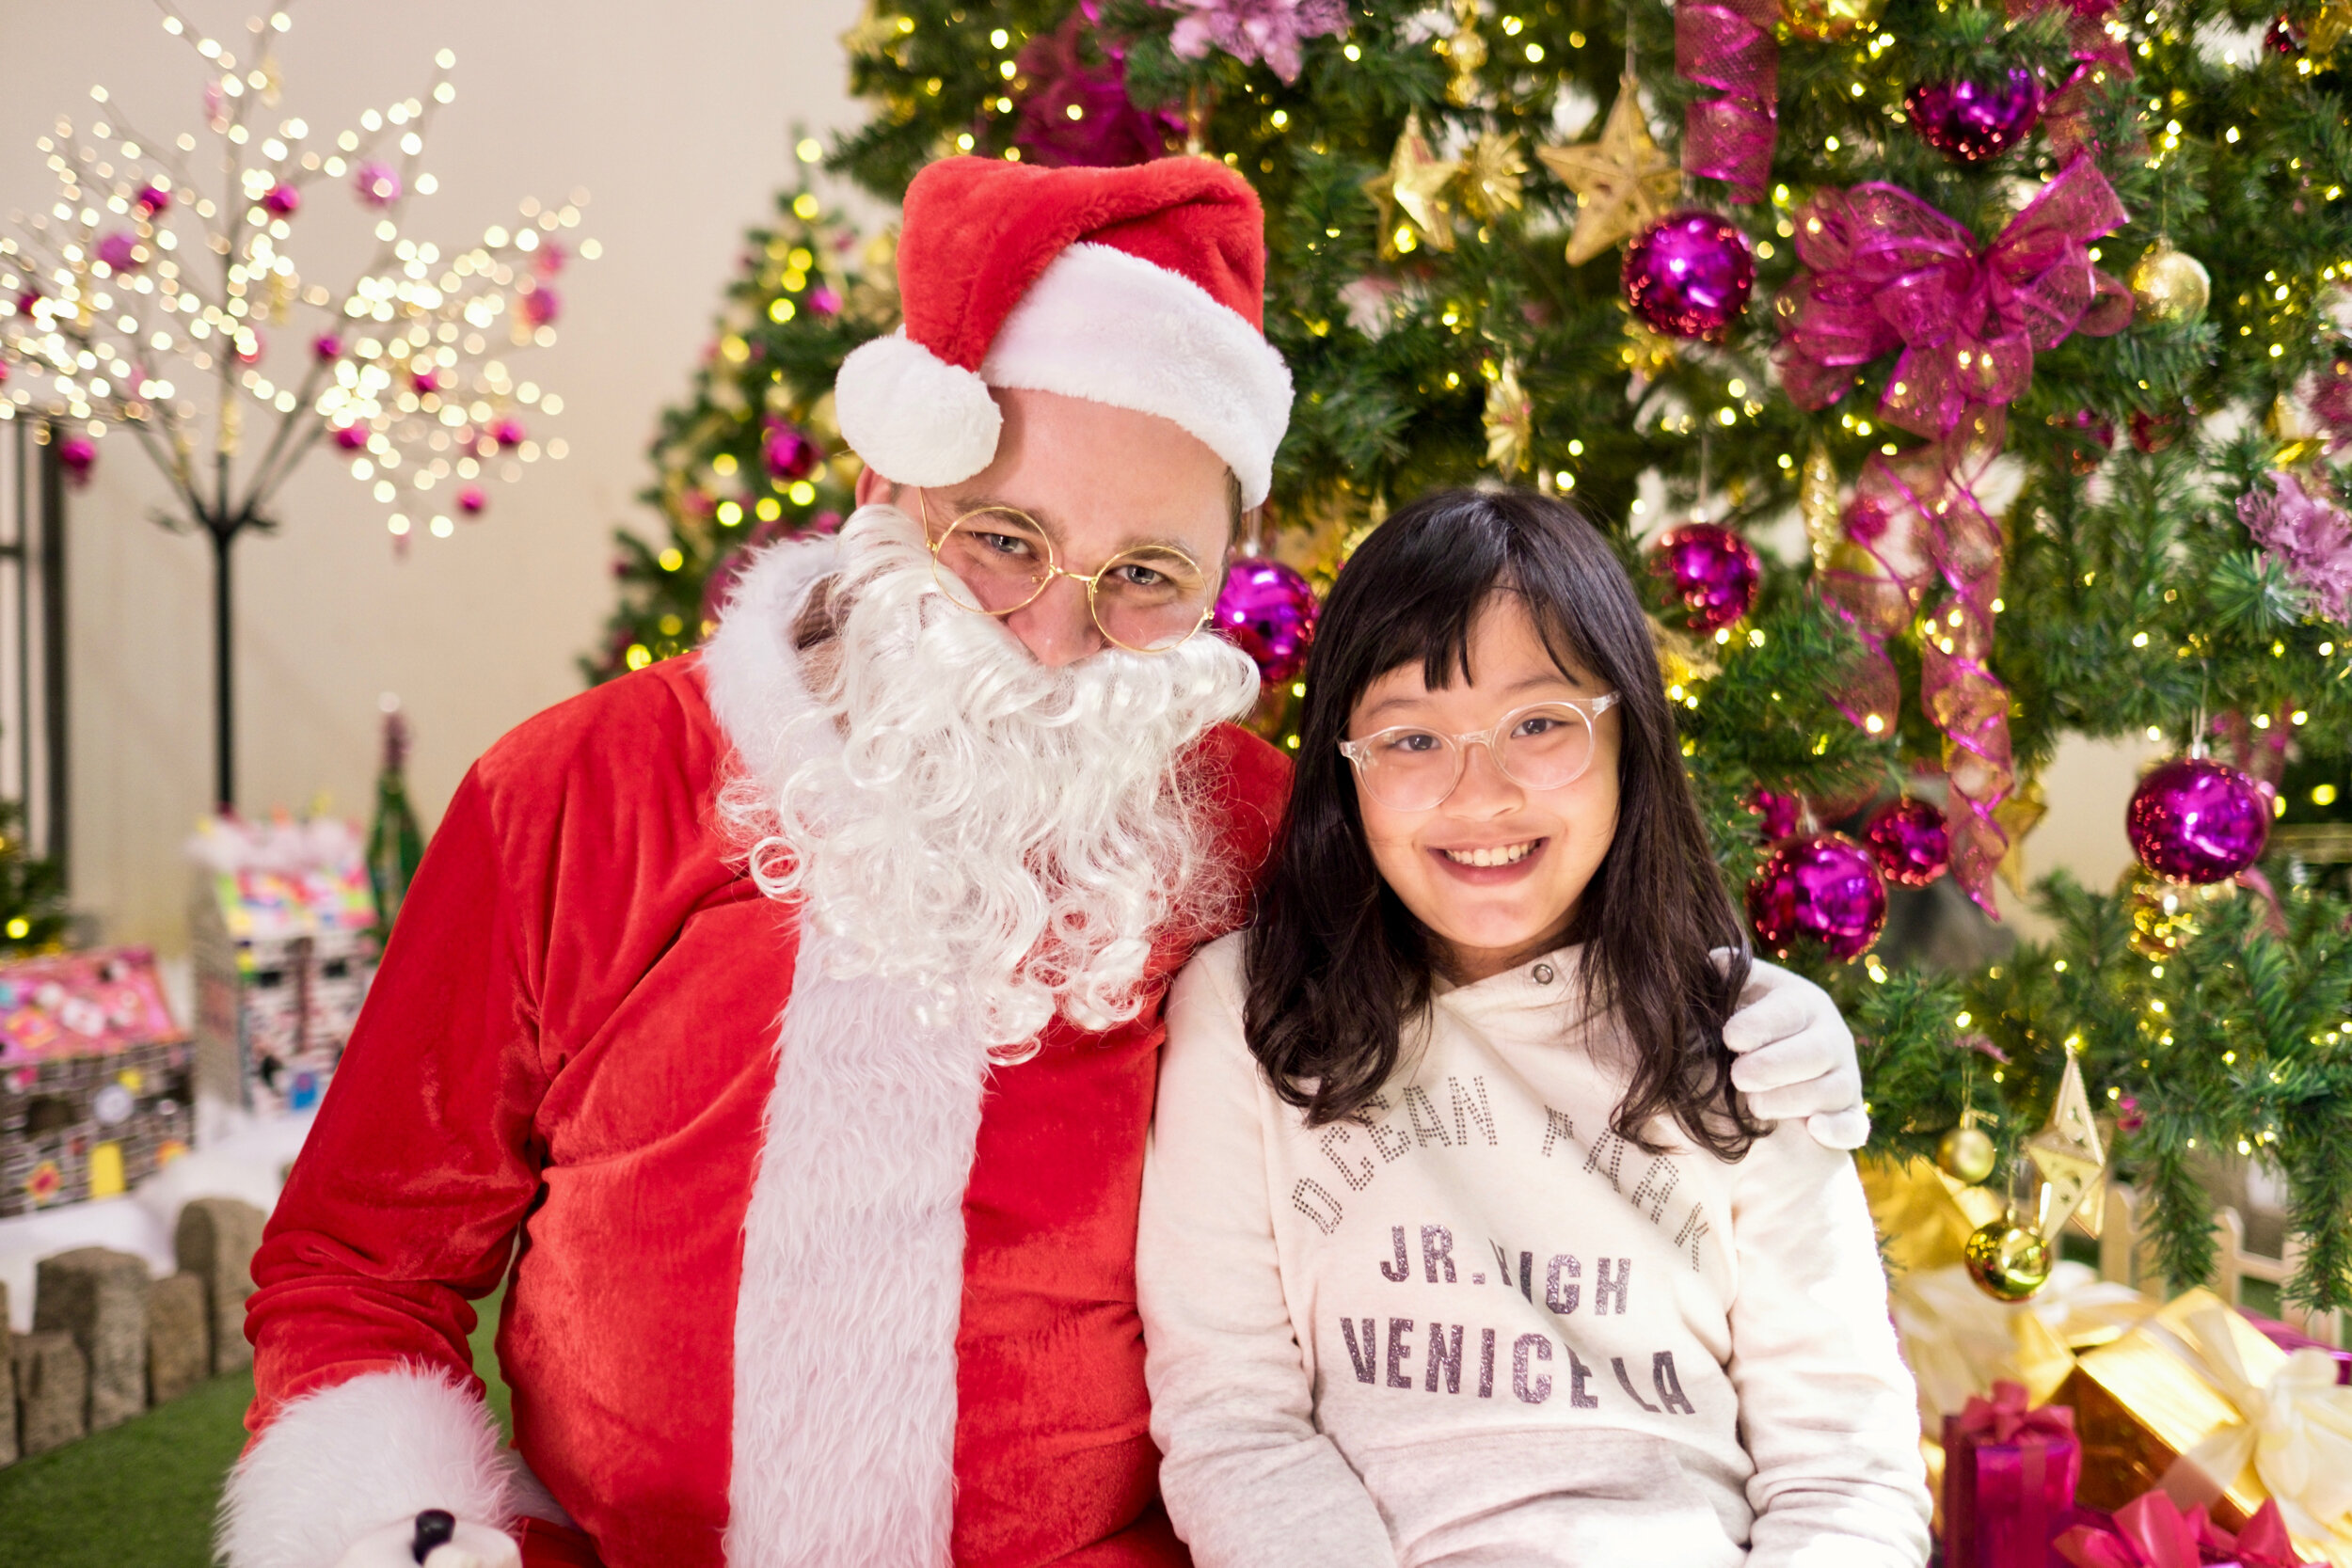 Photoshoot with Santa Clause-645.jpg